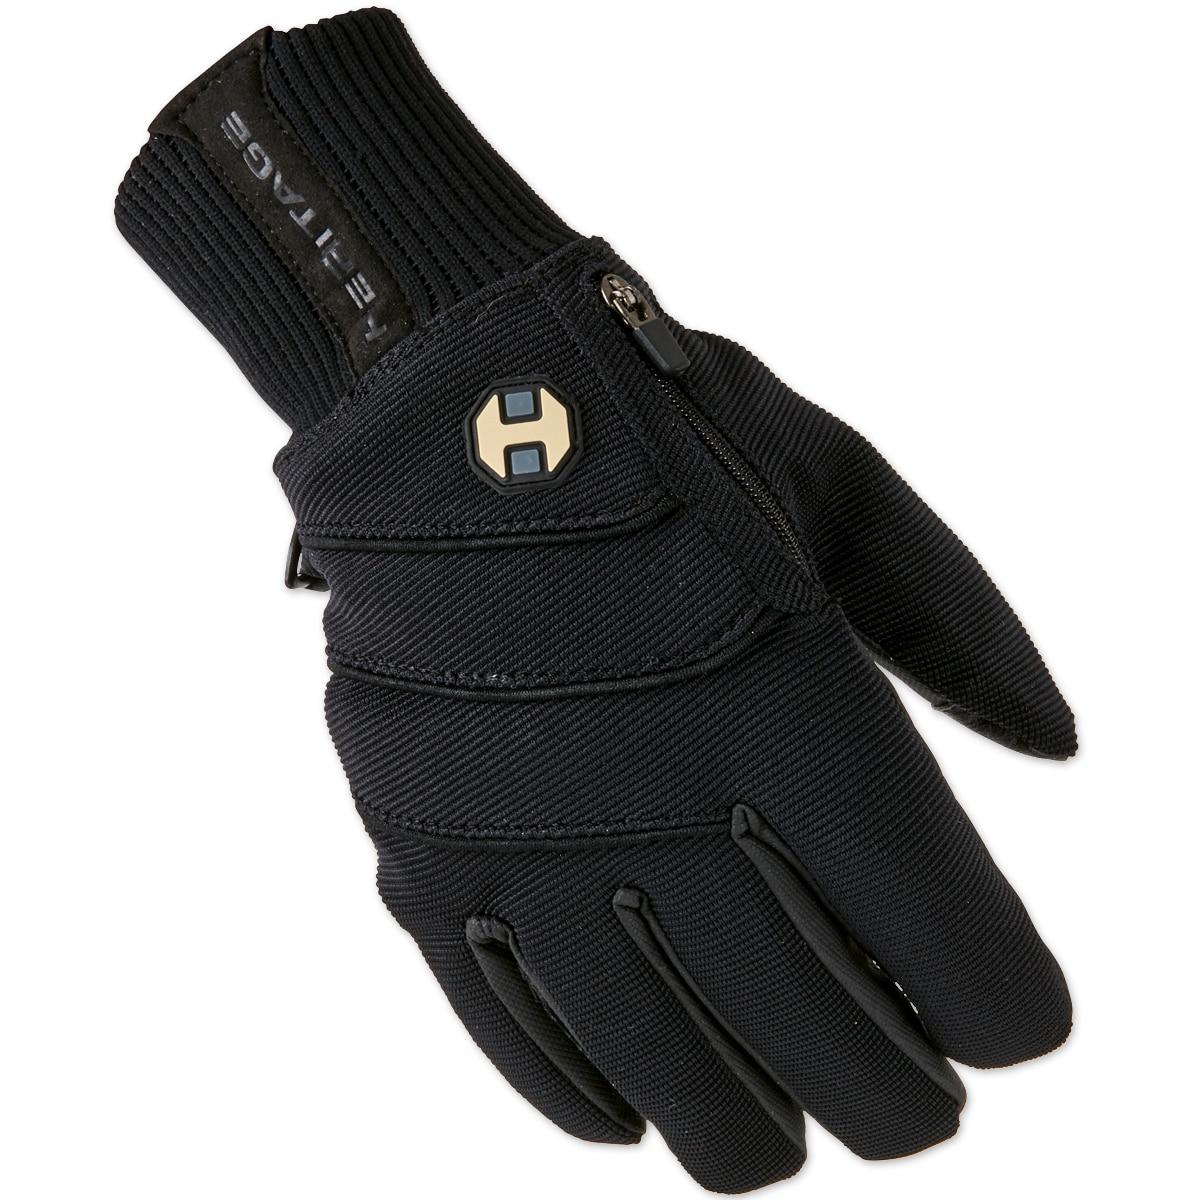 d843c91b9ffe4 Heritage Extreme Winter Gloves